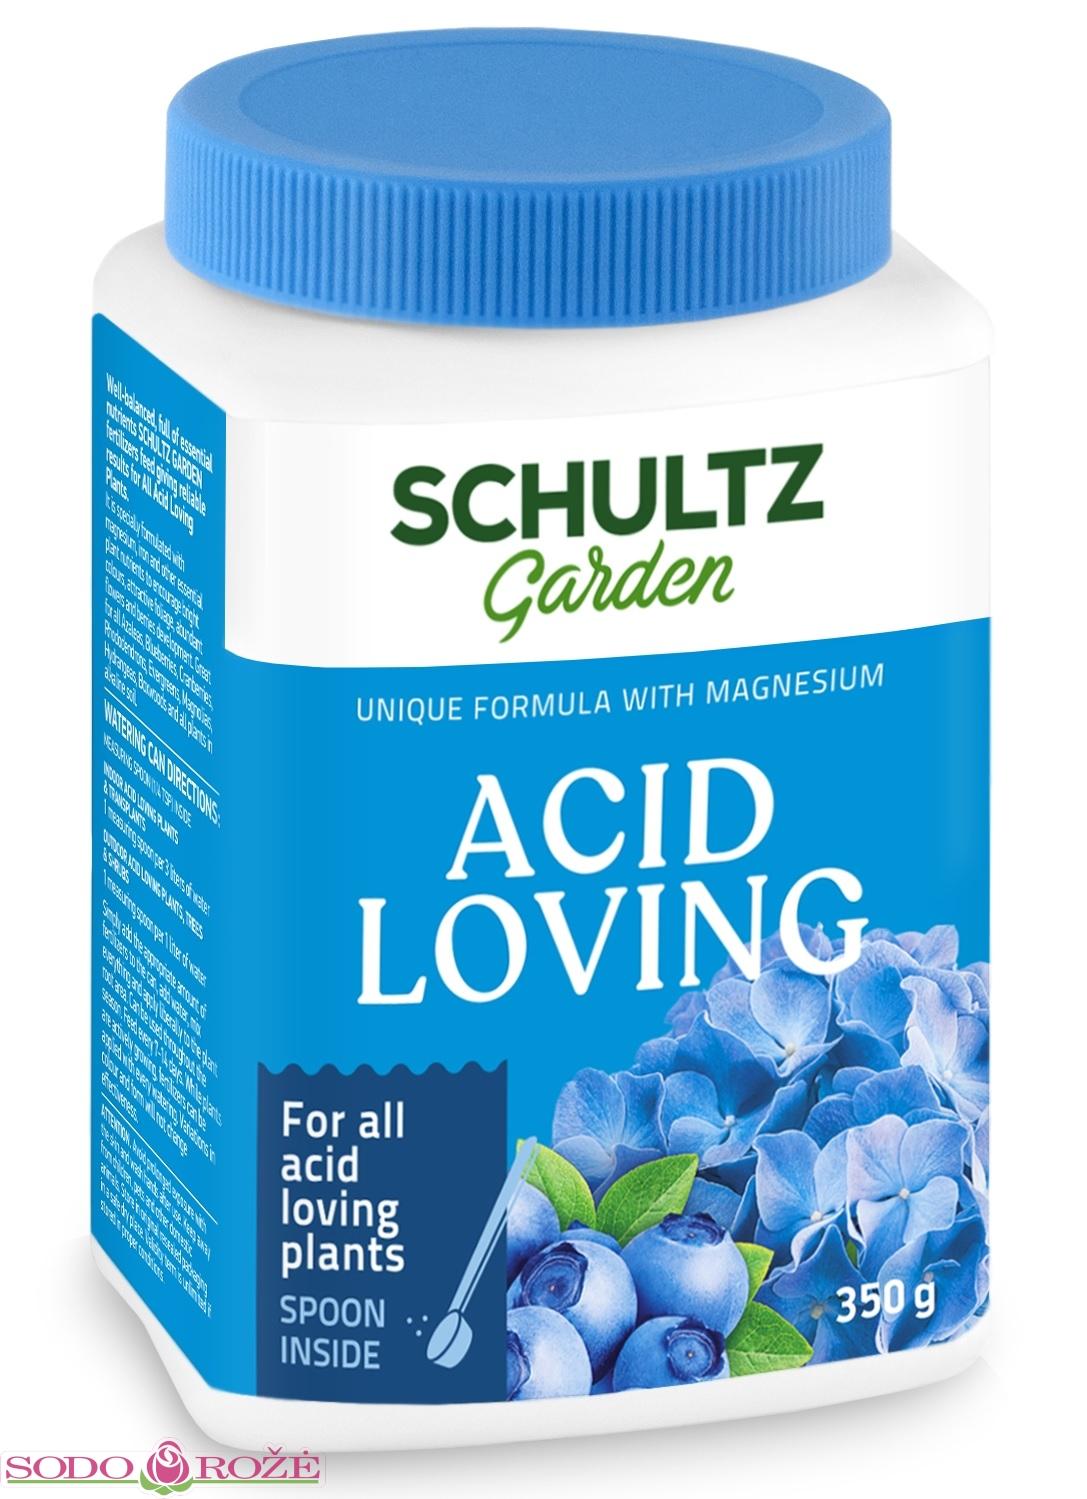 SCHULTZ Acid Loving (Rūgščios trąšos) 350g